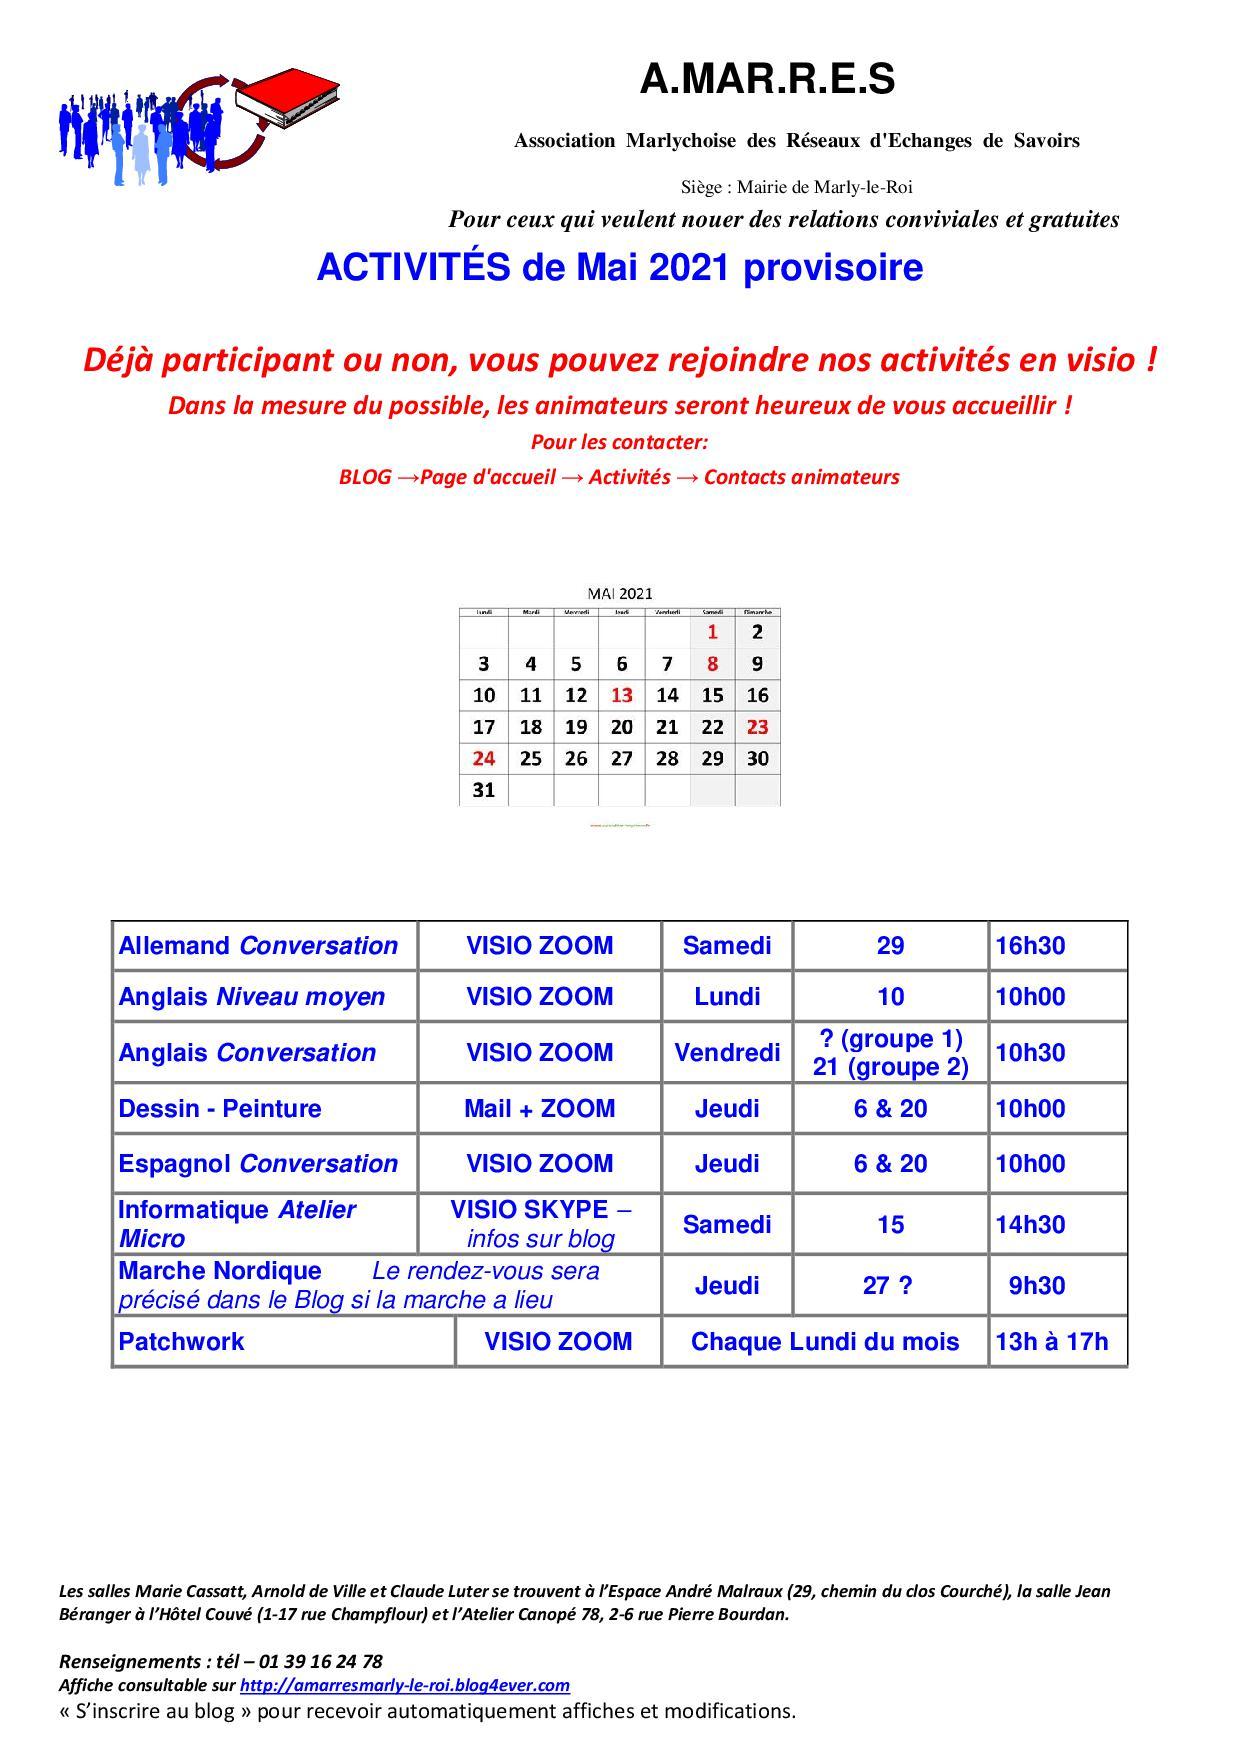 Affiche 2021-05 provisoire.jpg